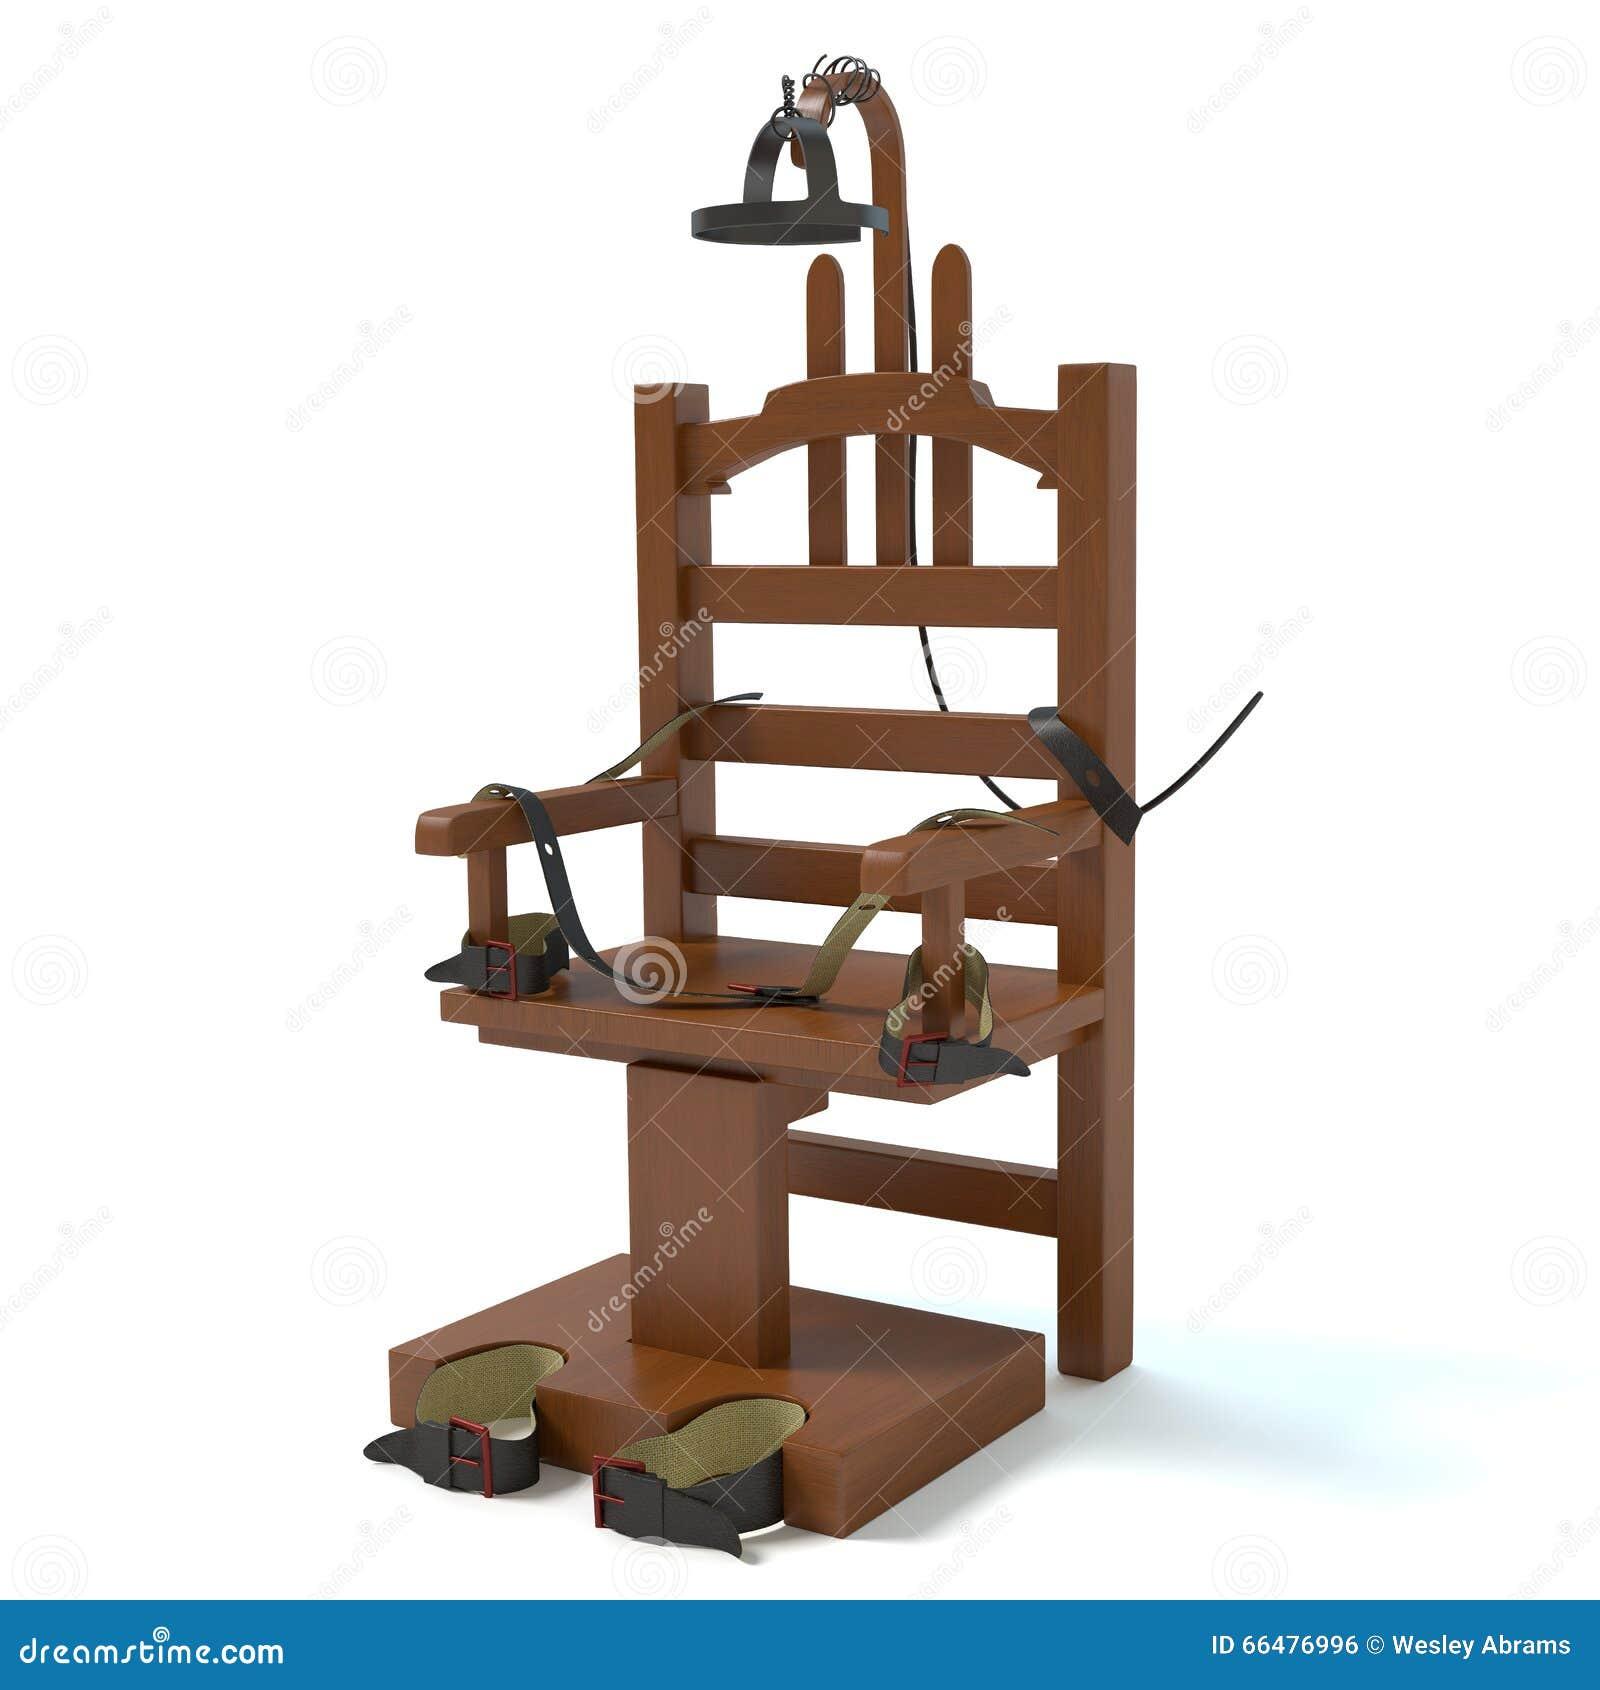 chaise lectrique illustration stock image du punition 66476996. Black Bedroom Furniture Sets. Home Design Ideas